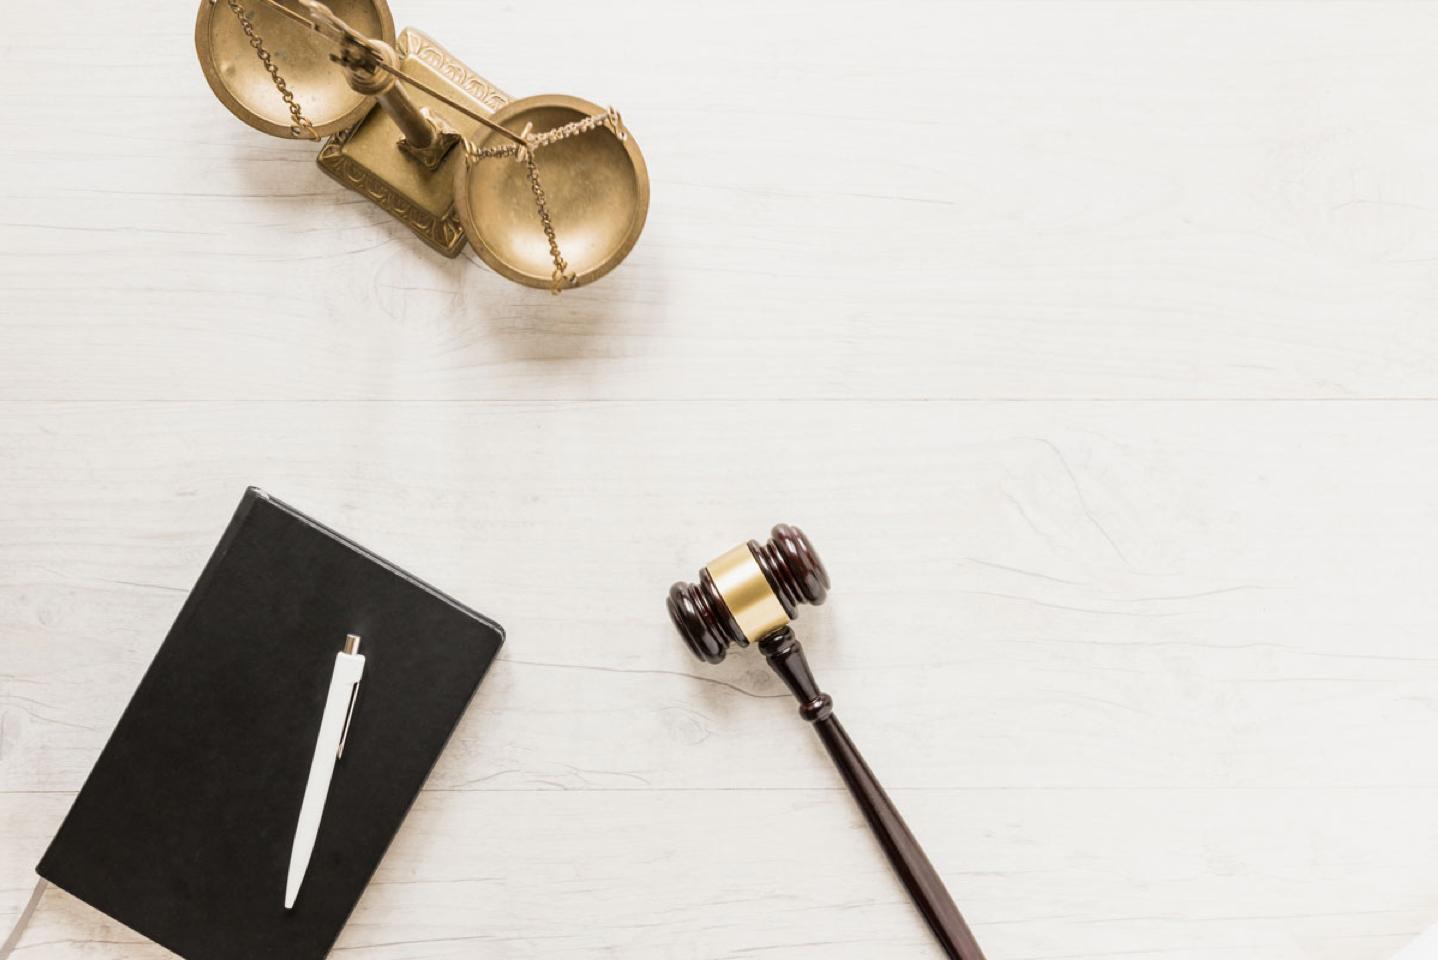 costa legal abogados torrevieja